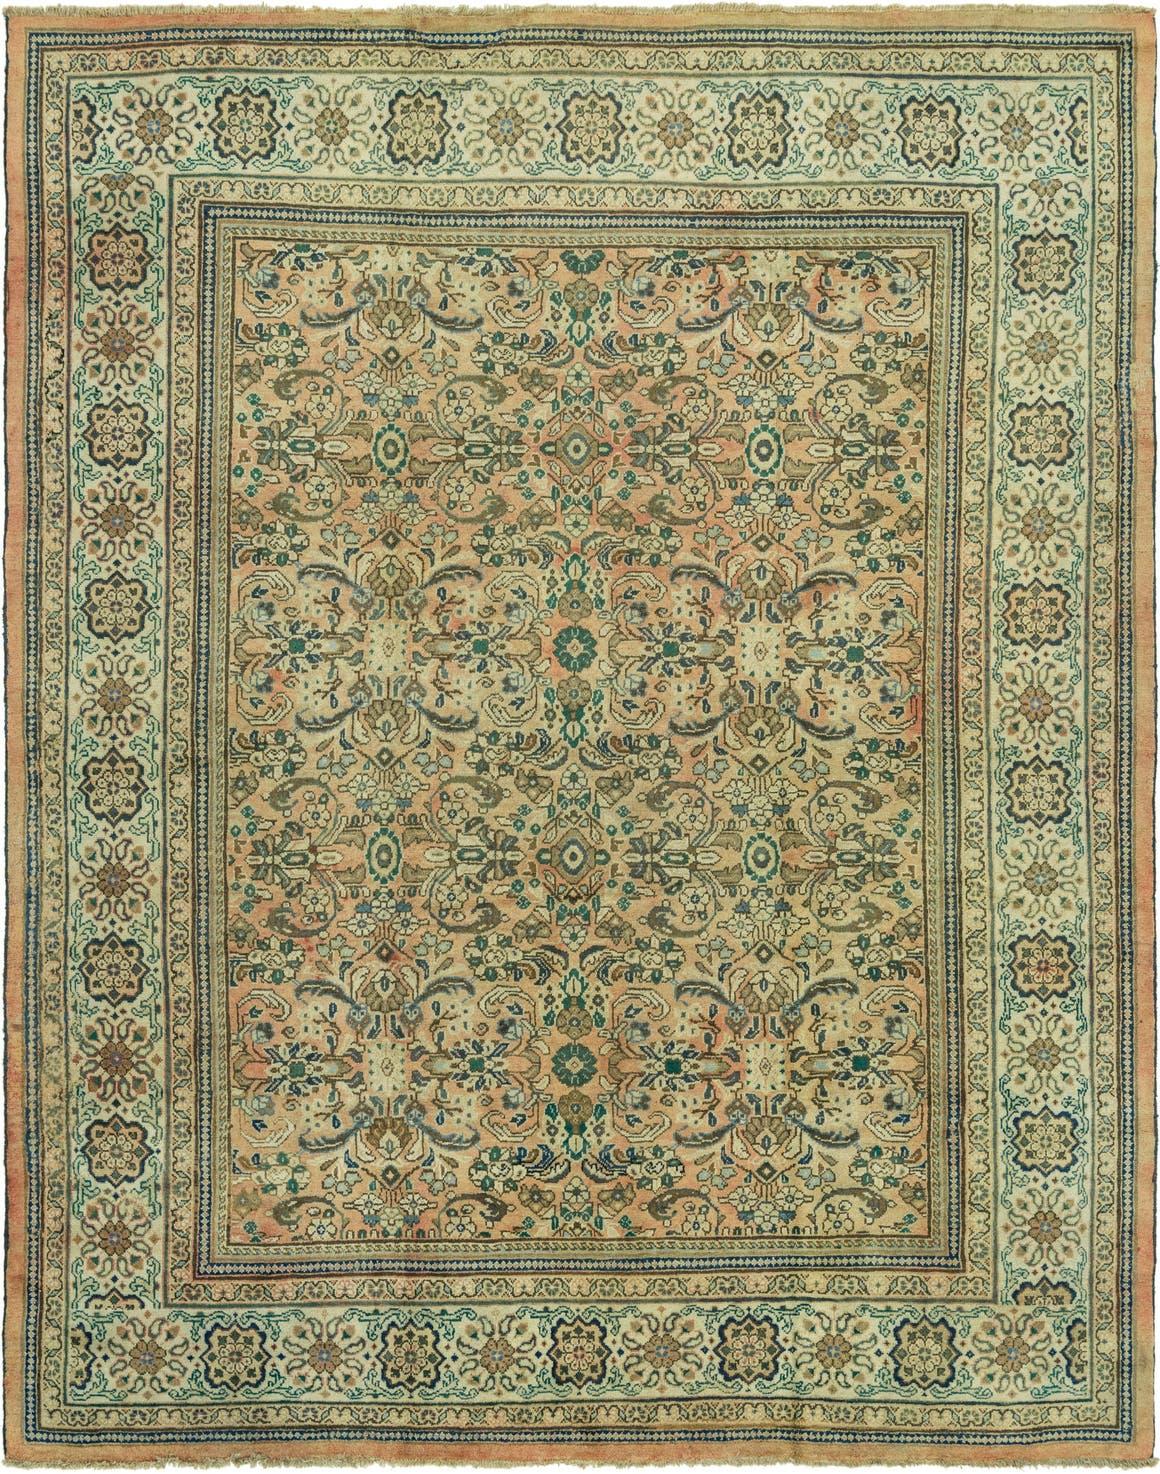 10' x 13' Mahal Persian Rug main image